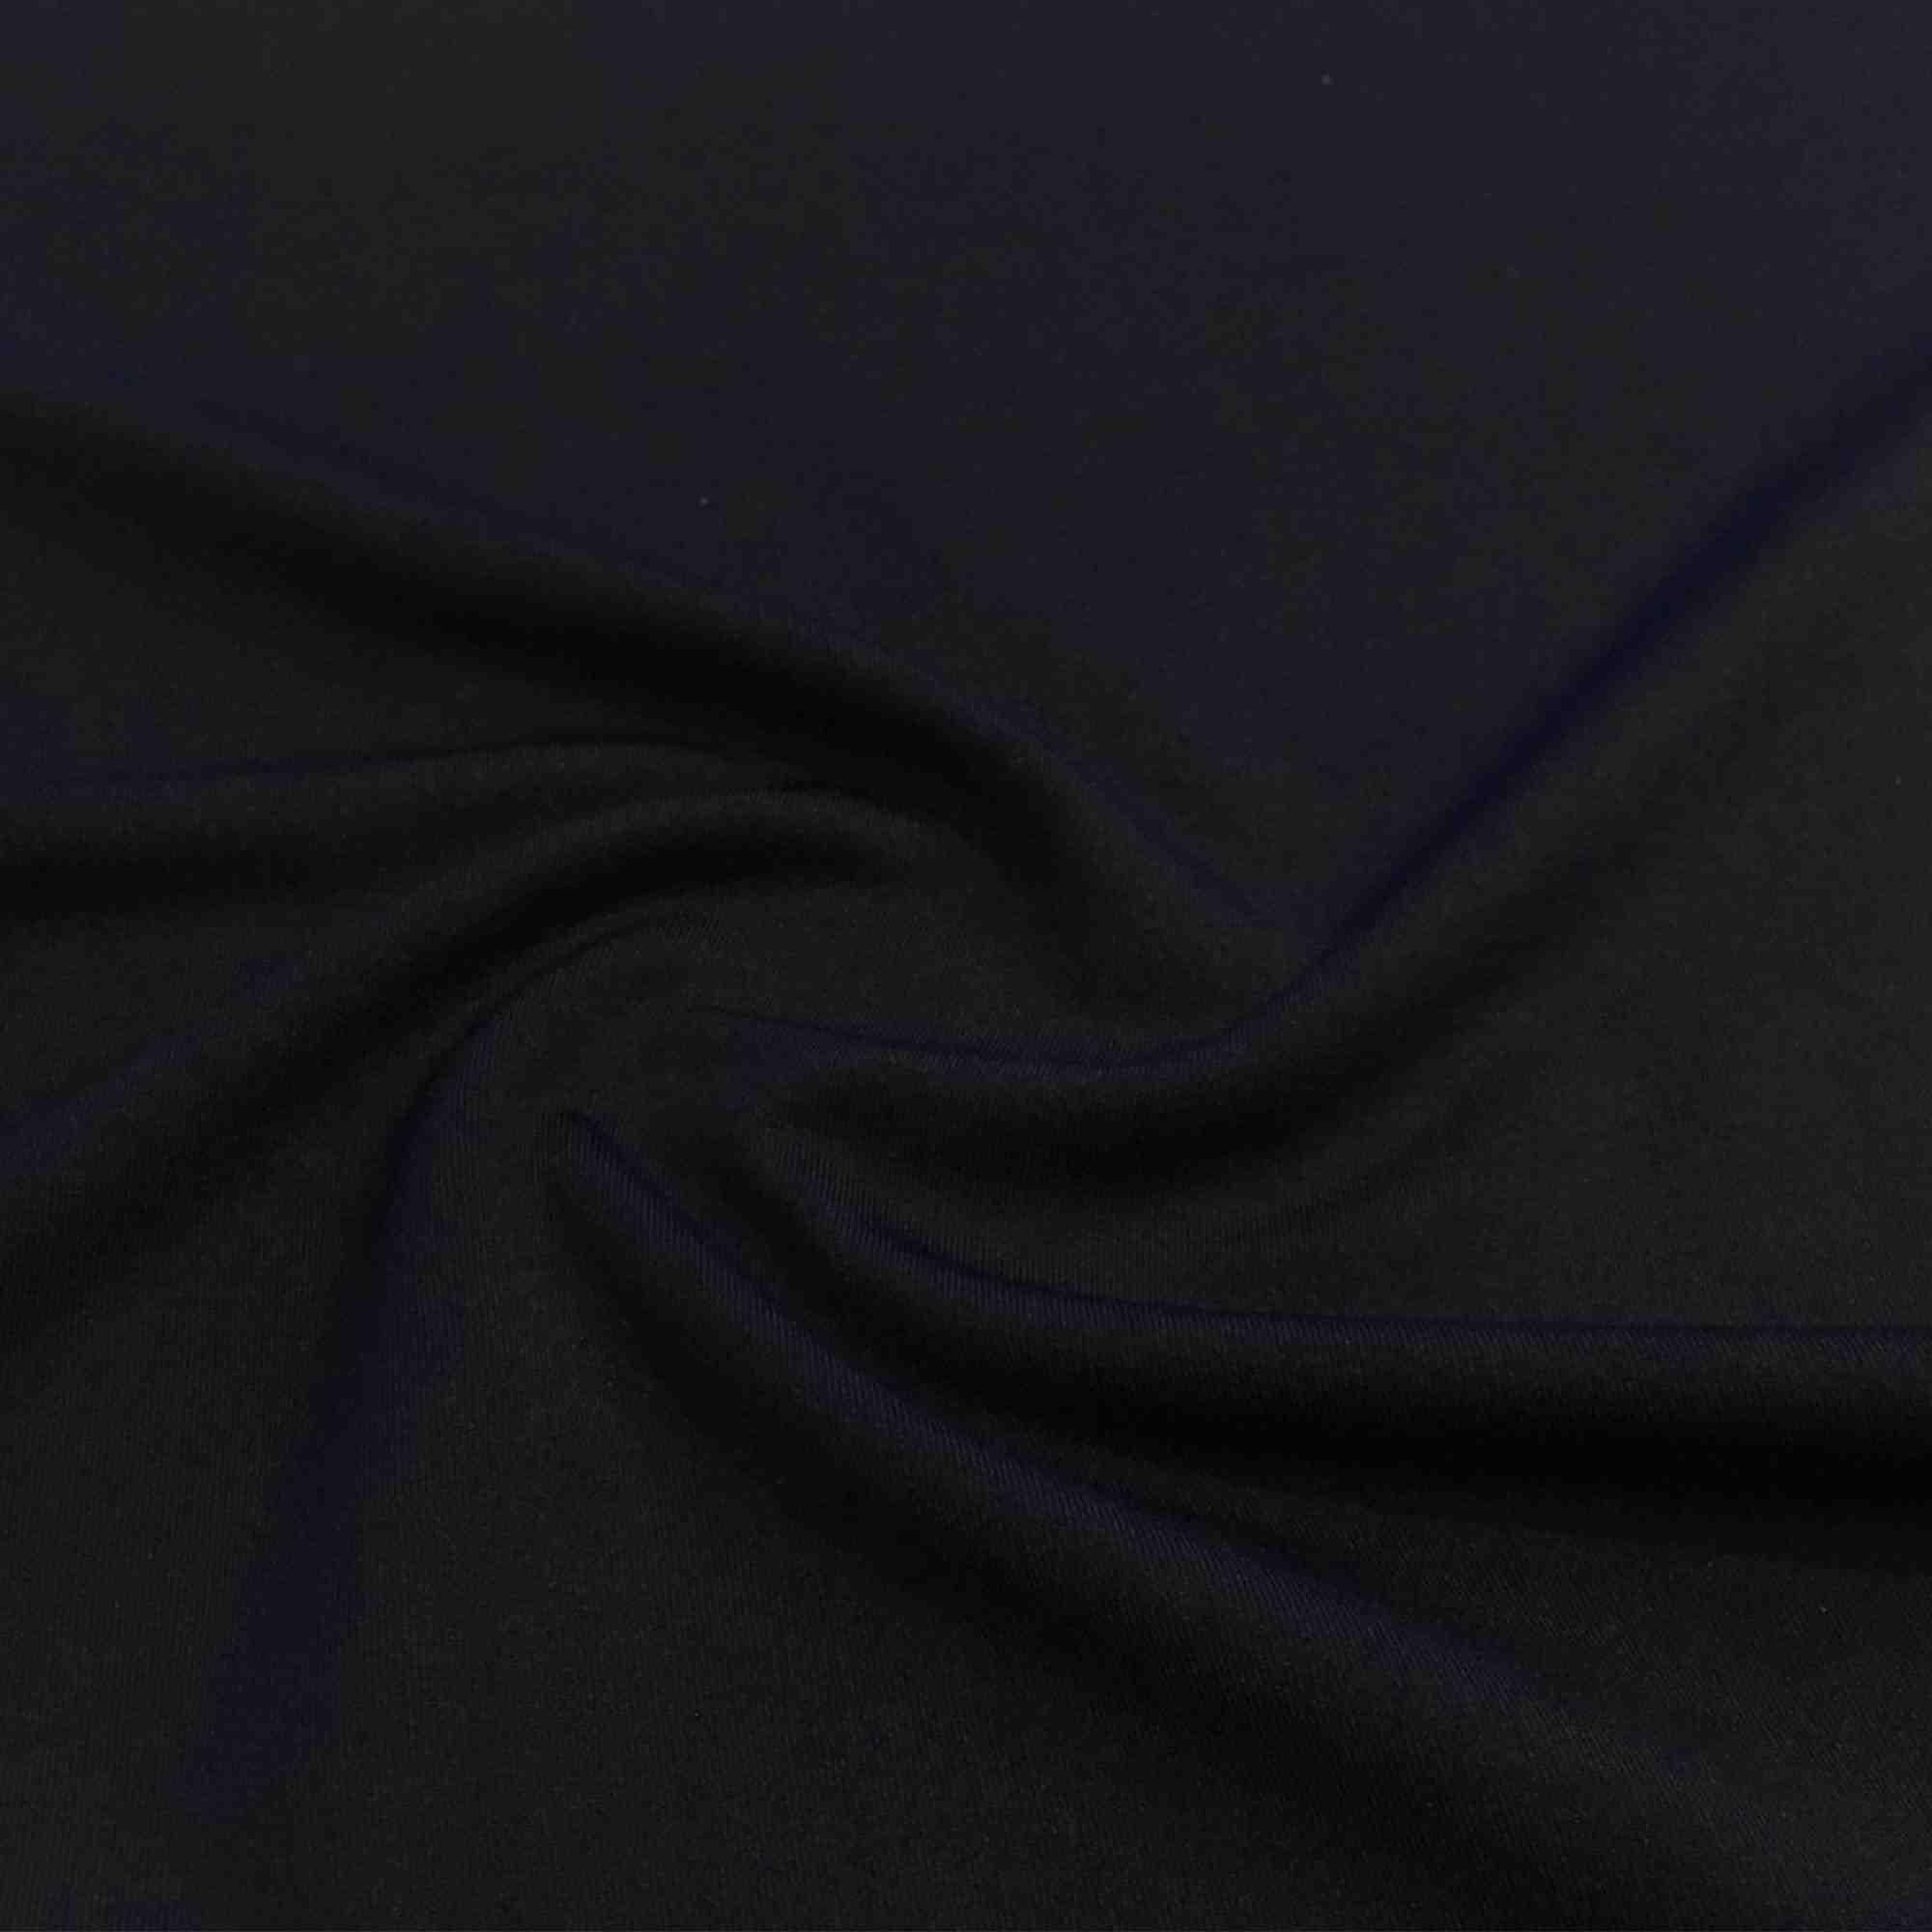 Poliplex Liso Azul Marinho